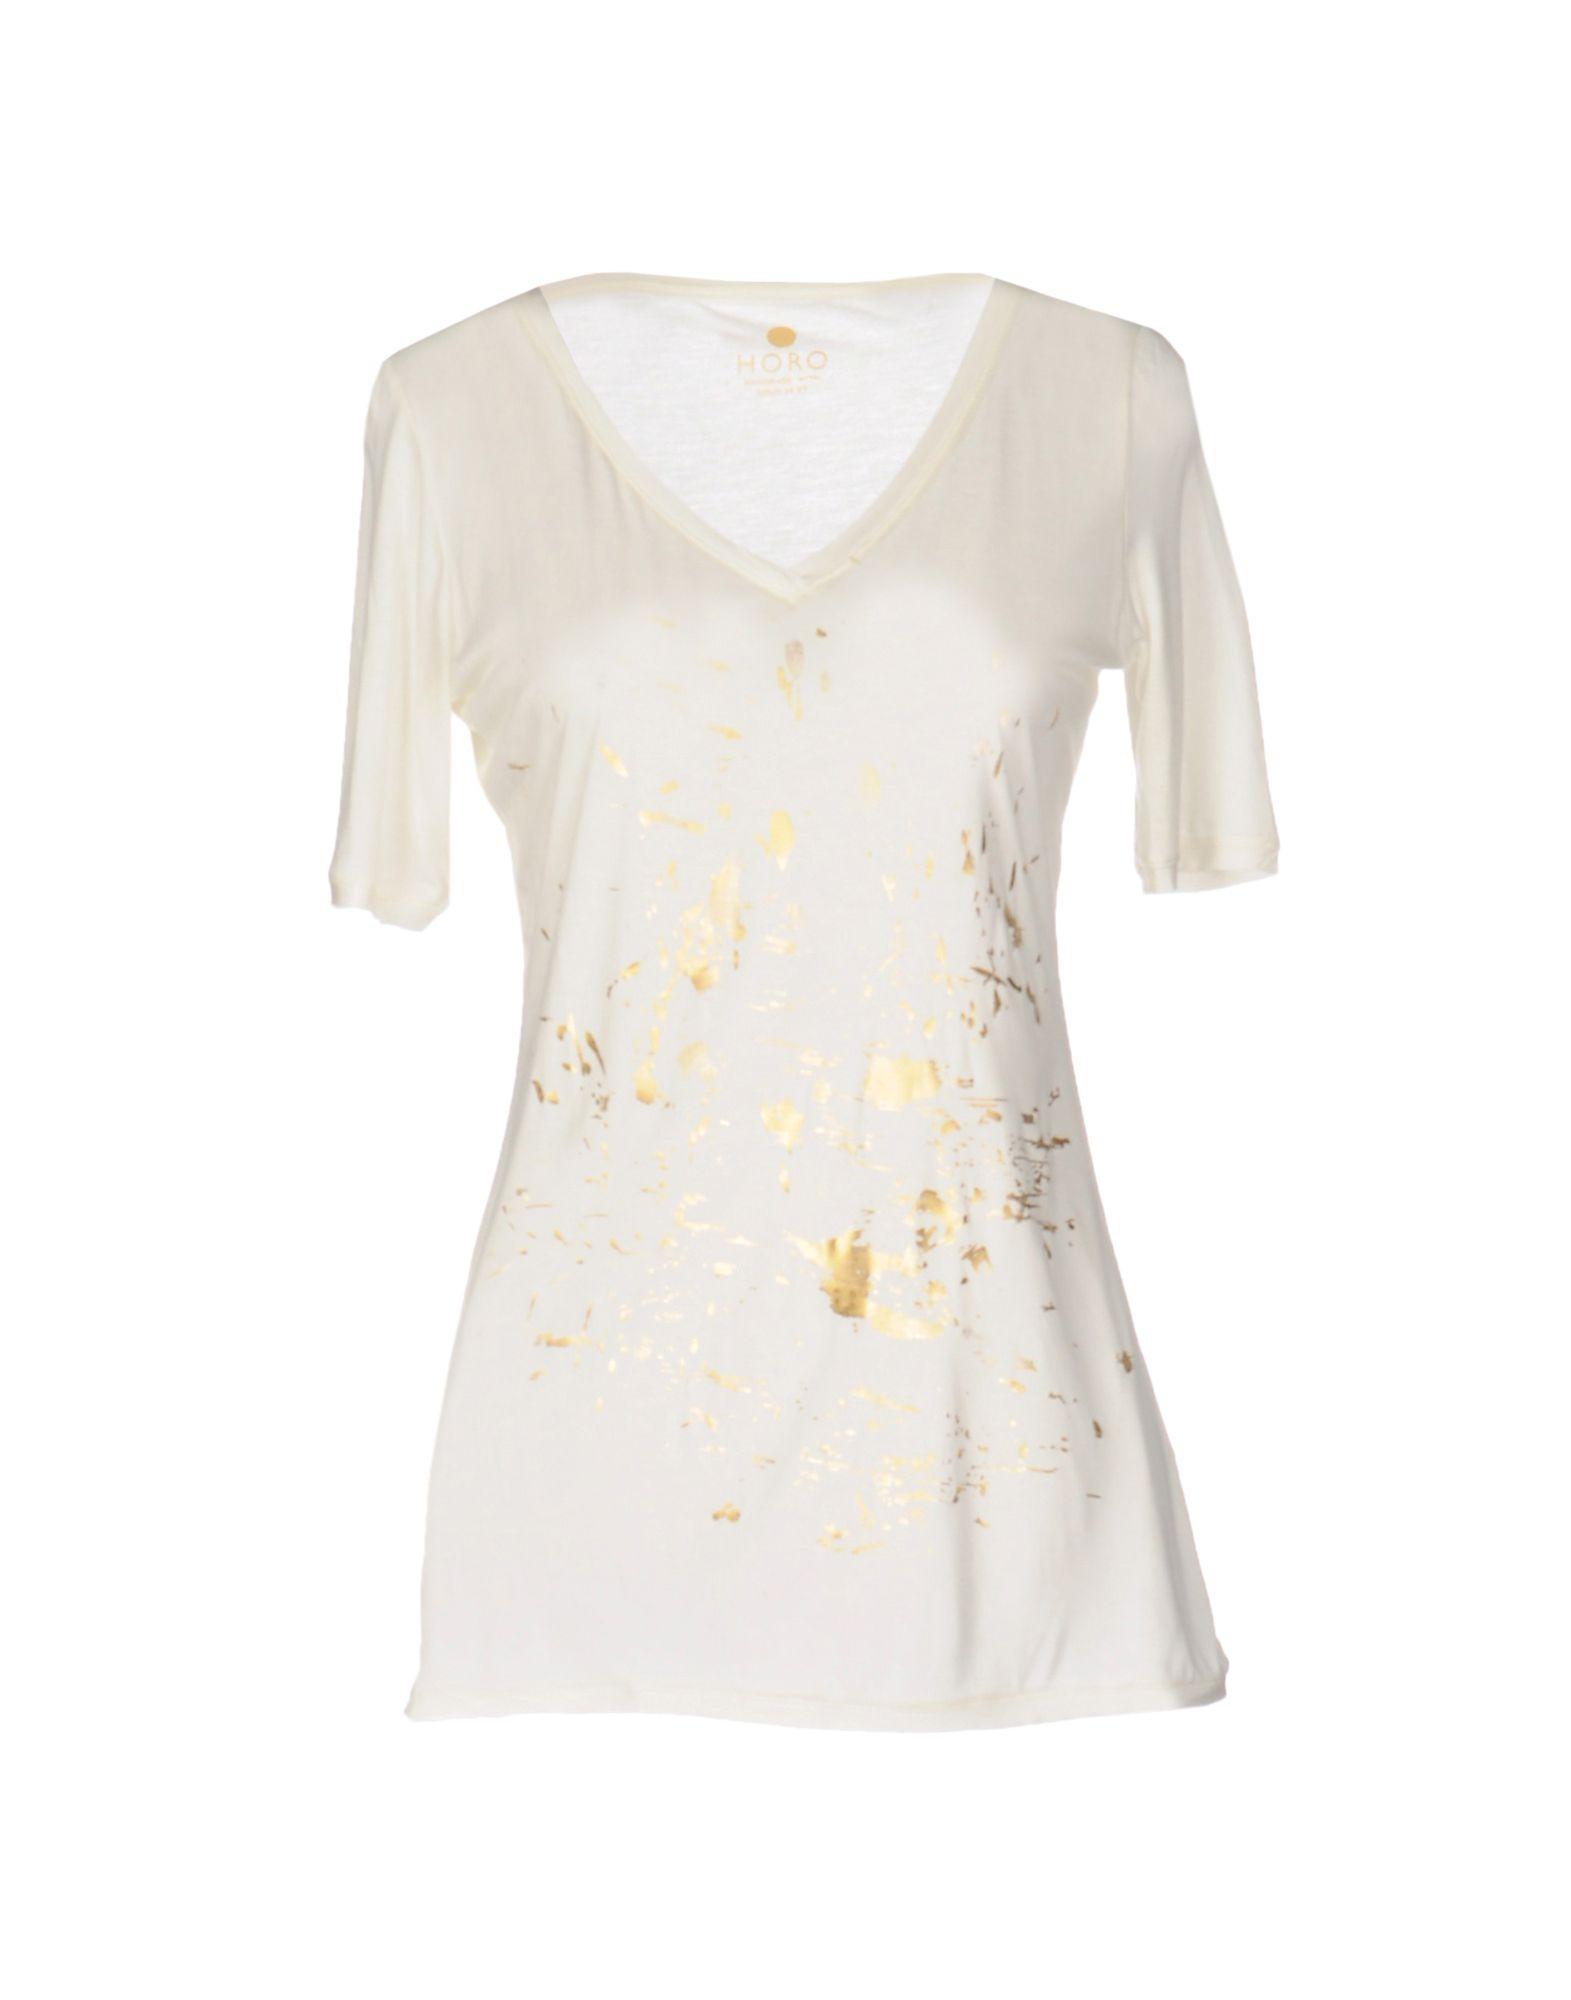 HORO T-Shirt in Ivory